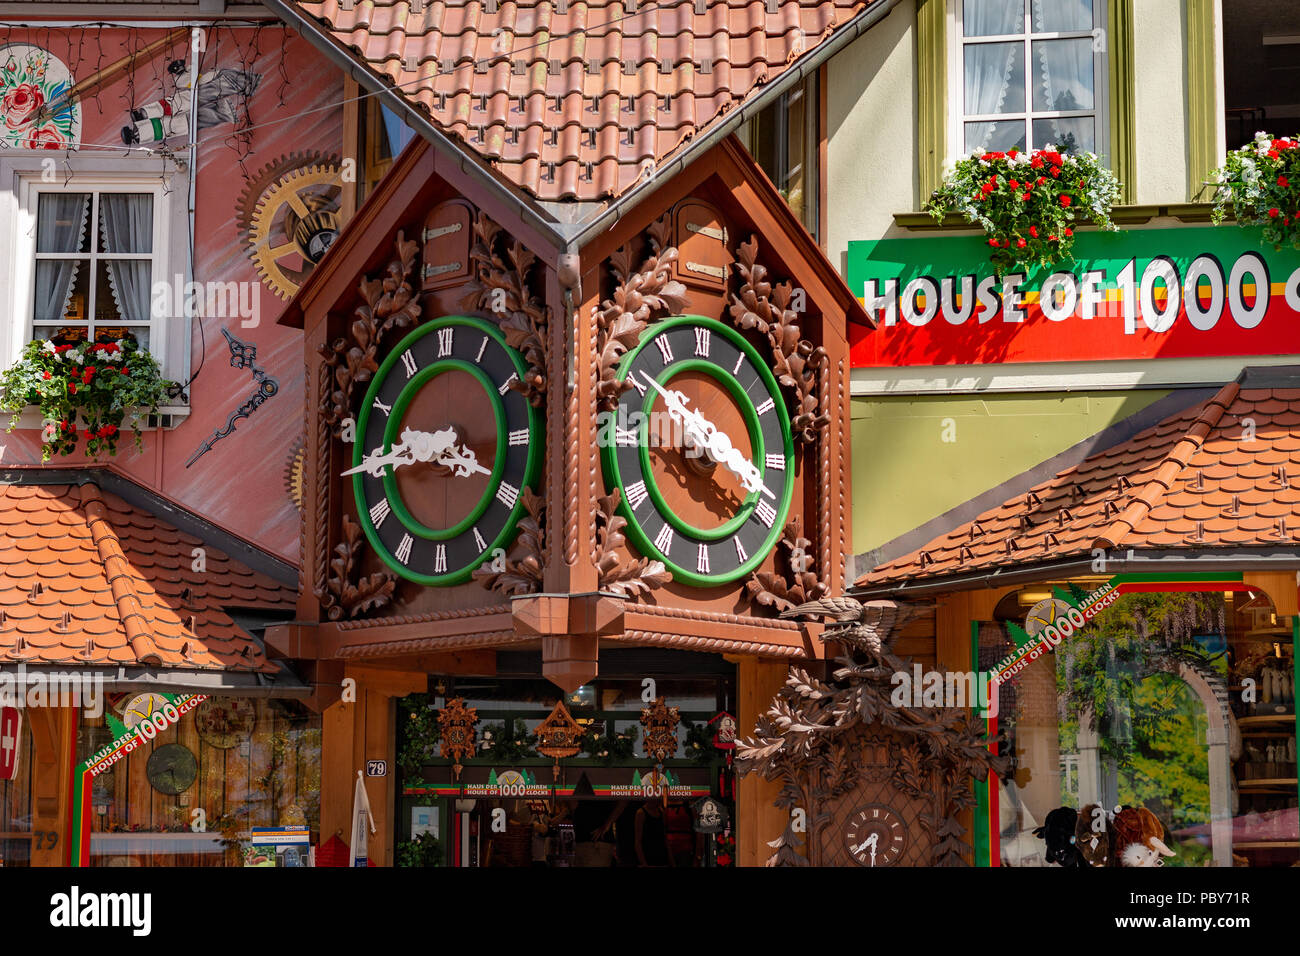 souvenir shop haus der 1000 uhren in triberg. Black Bedroom Furniture Sets. Home Design Ideas